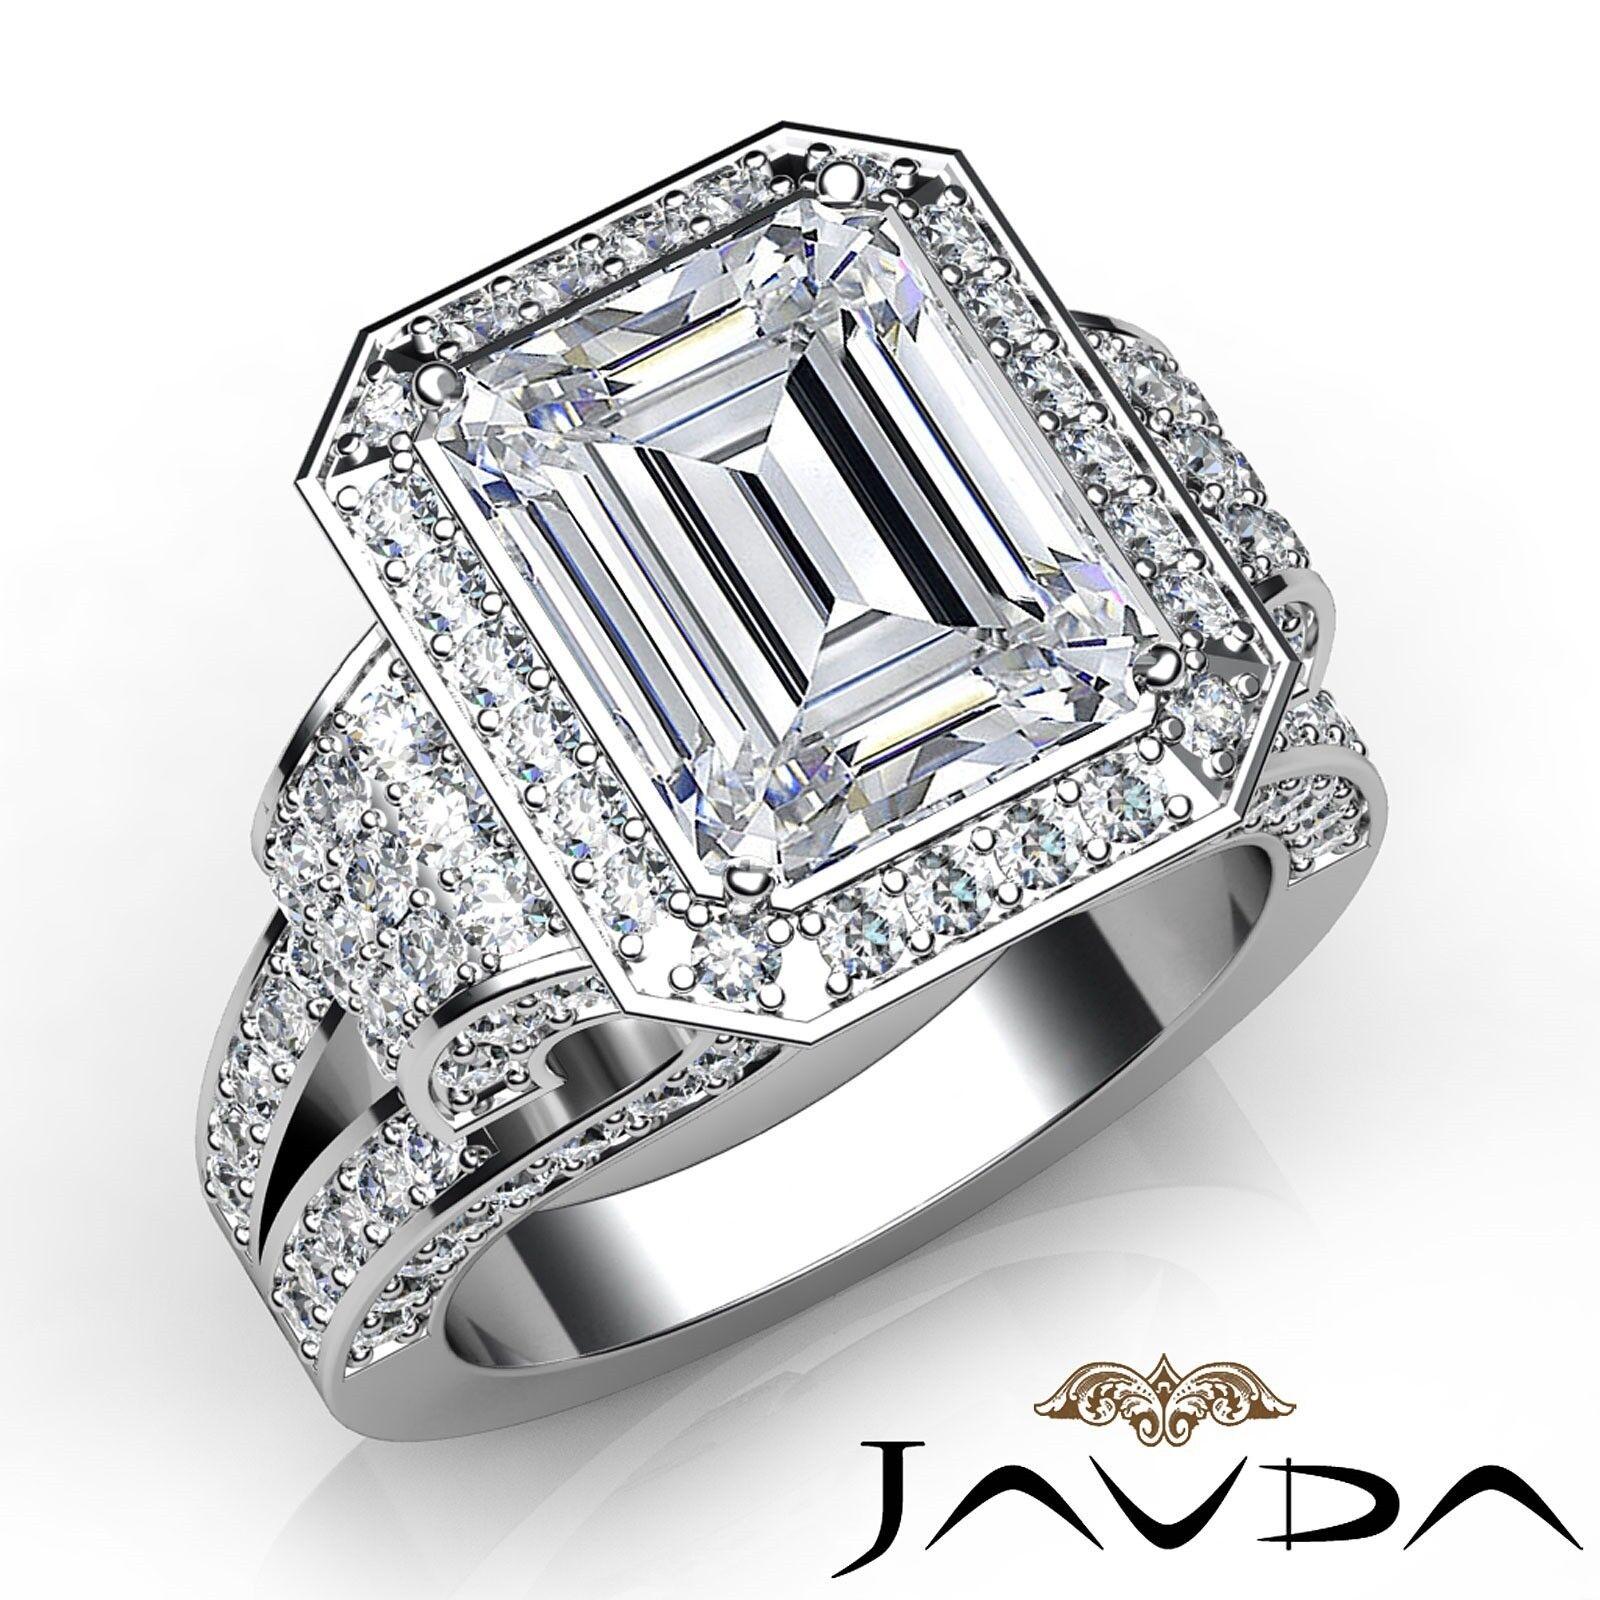 3.4ctw Antique Vintage Halo Emerald Diamond Engagement Ring GIA G-VS2 White Gold